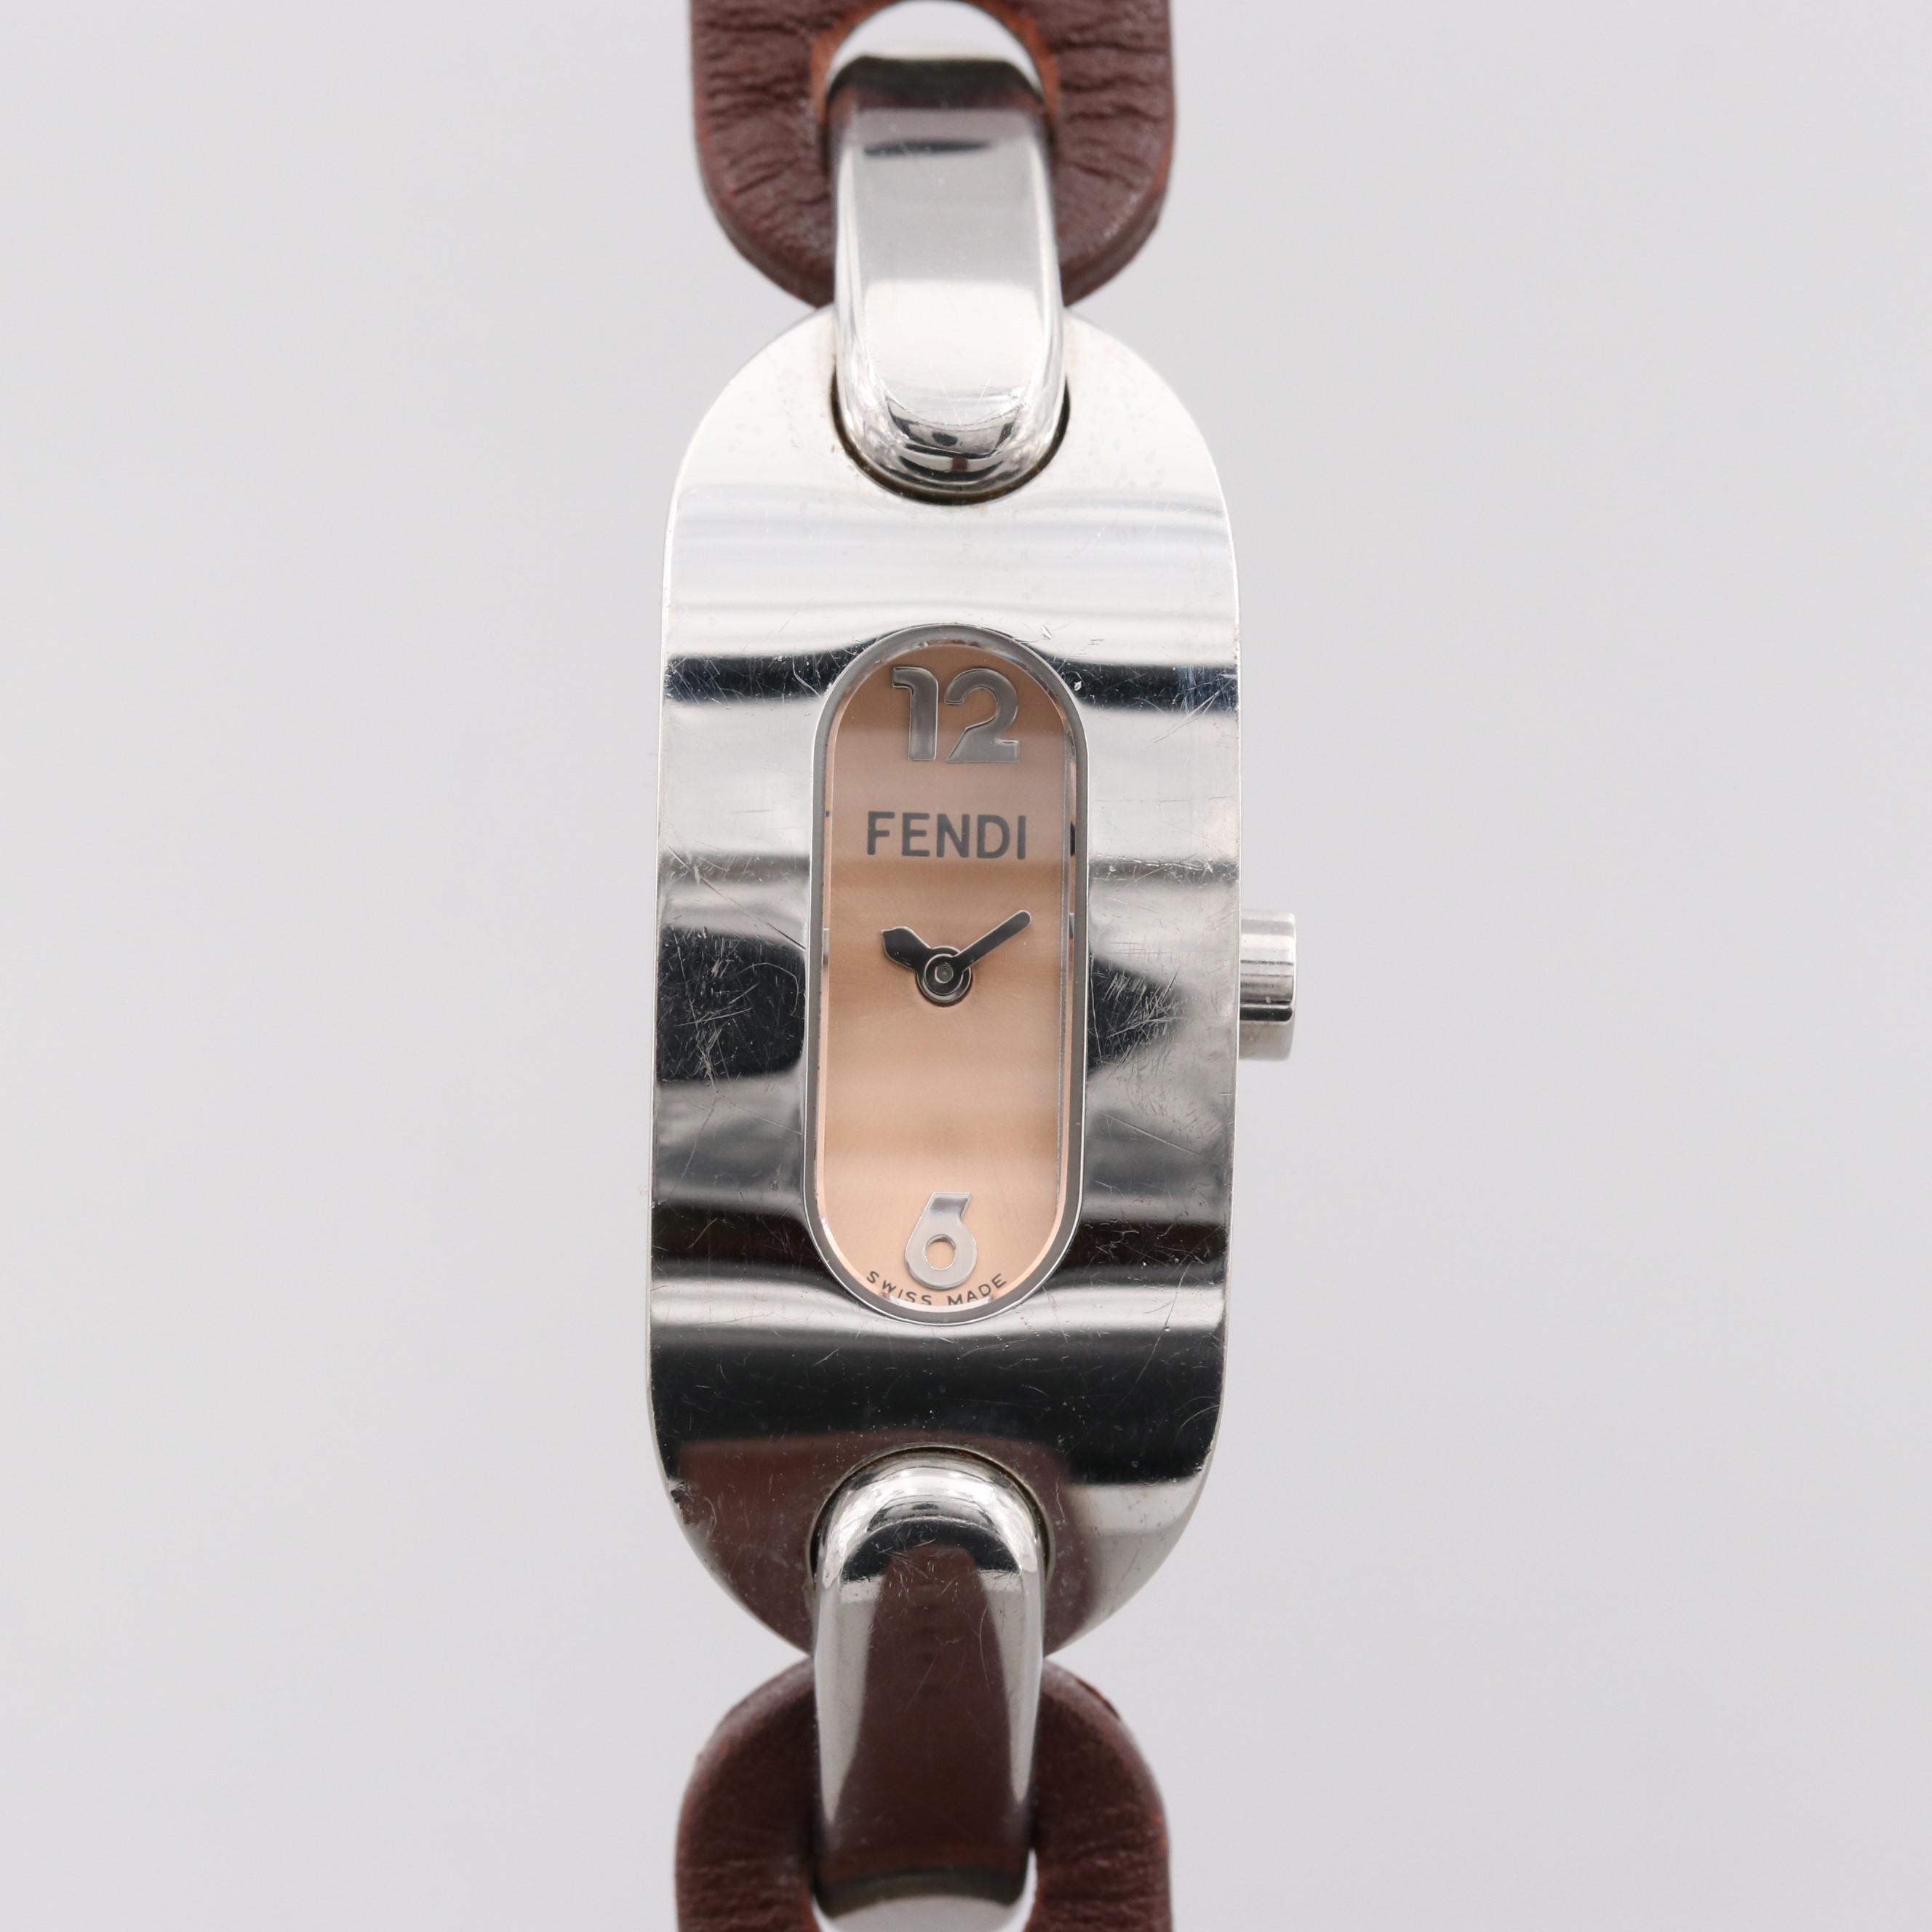 Fendi Stainless Steel Quartz Wristwatch